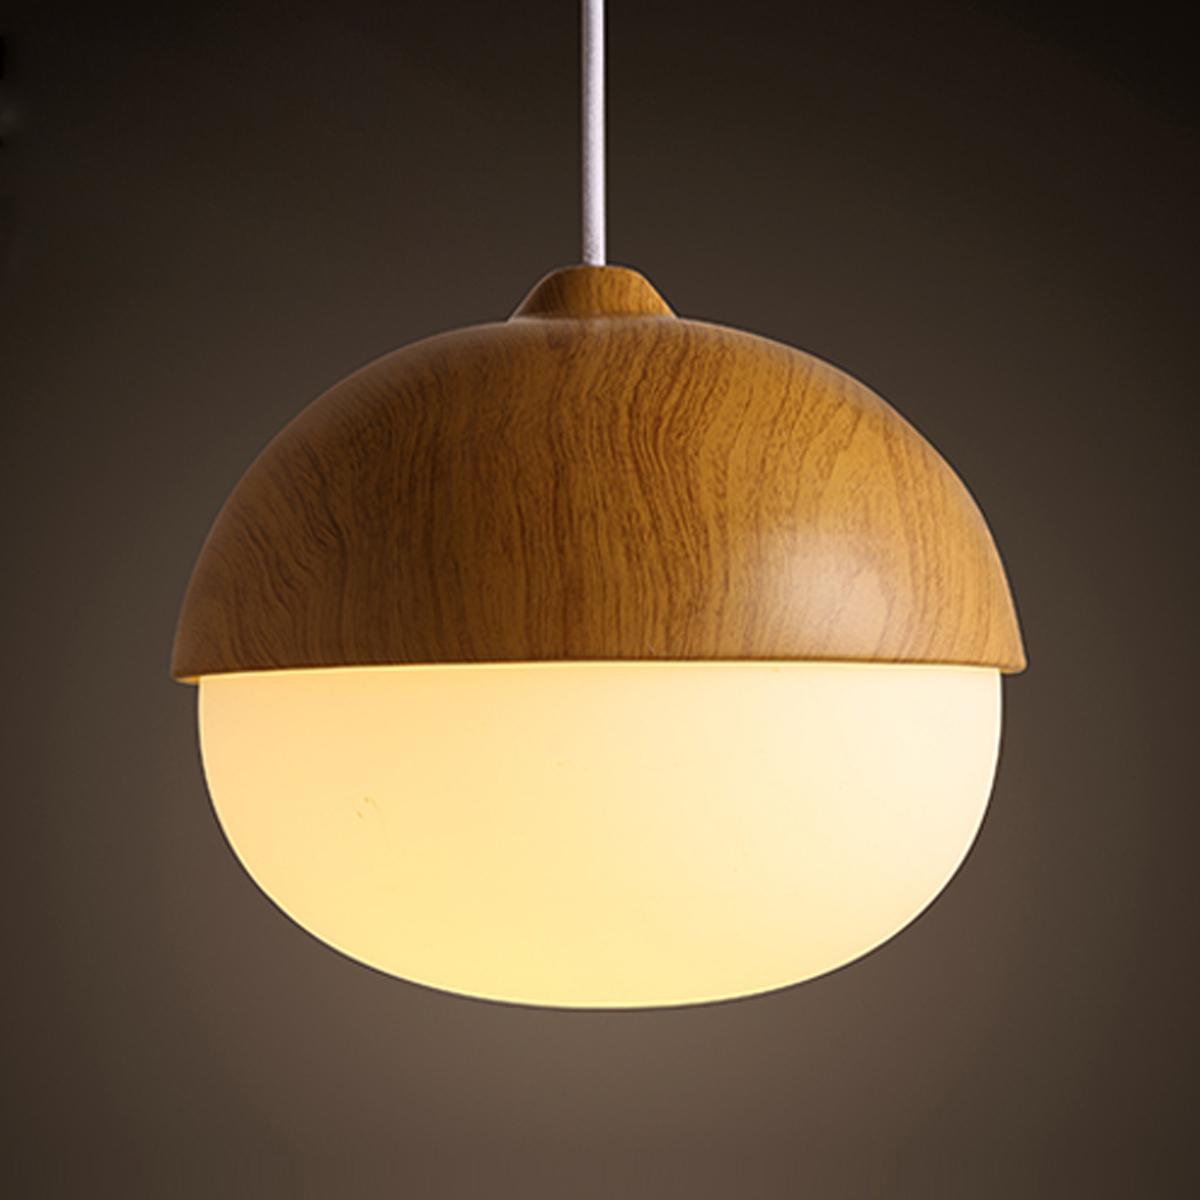 light bedroom dining room lighting decor fixtures in pendant lights